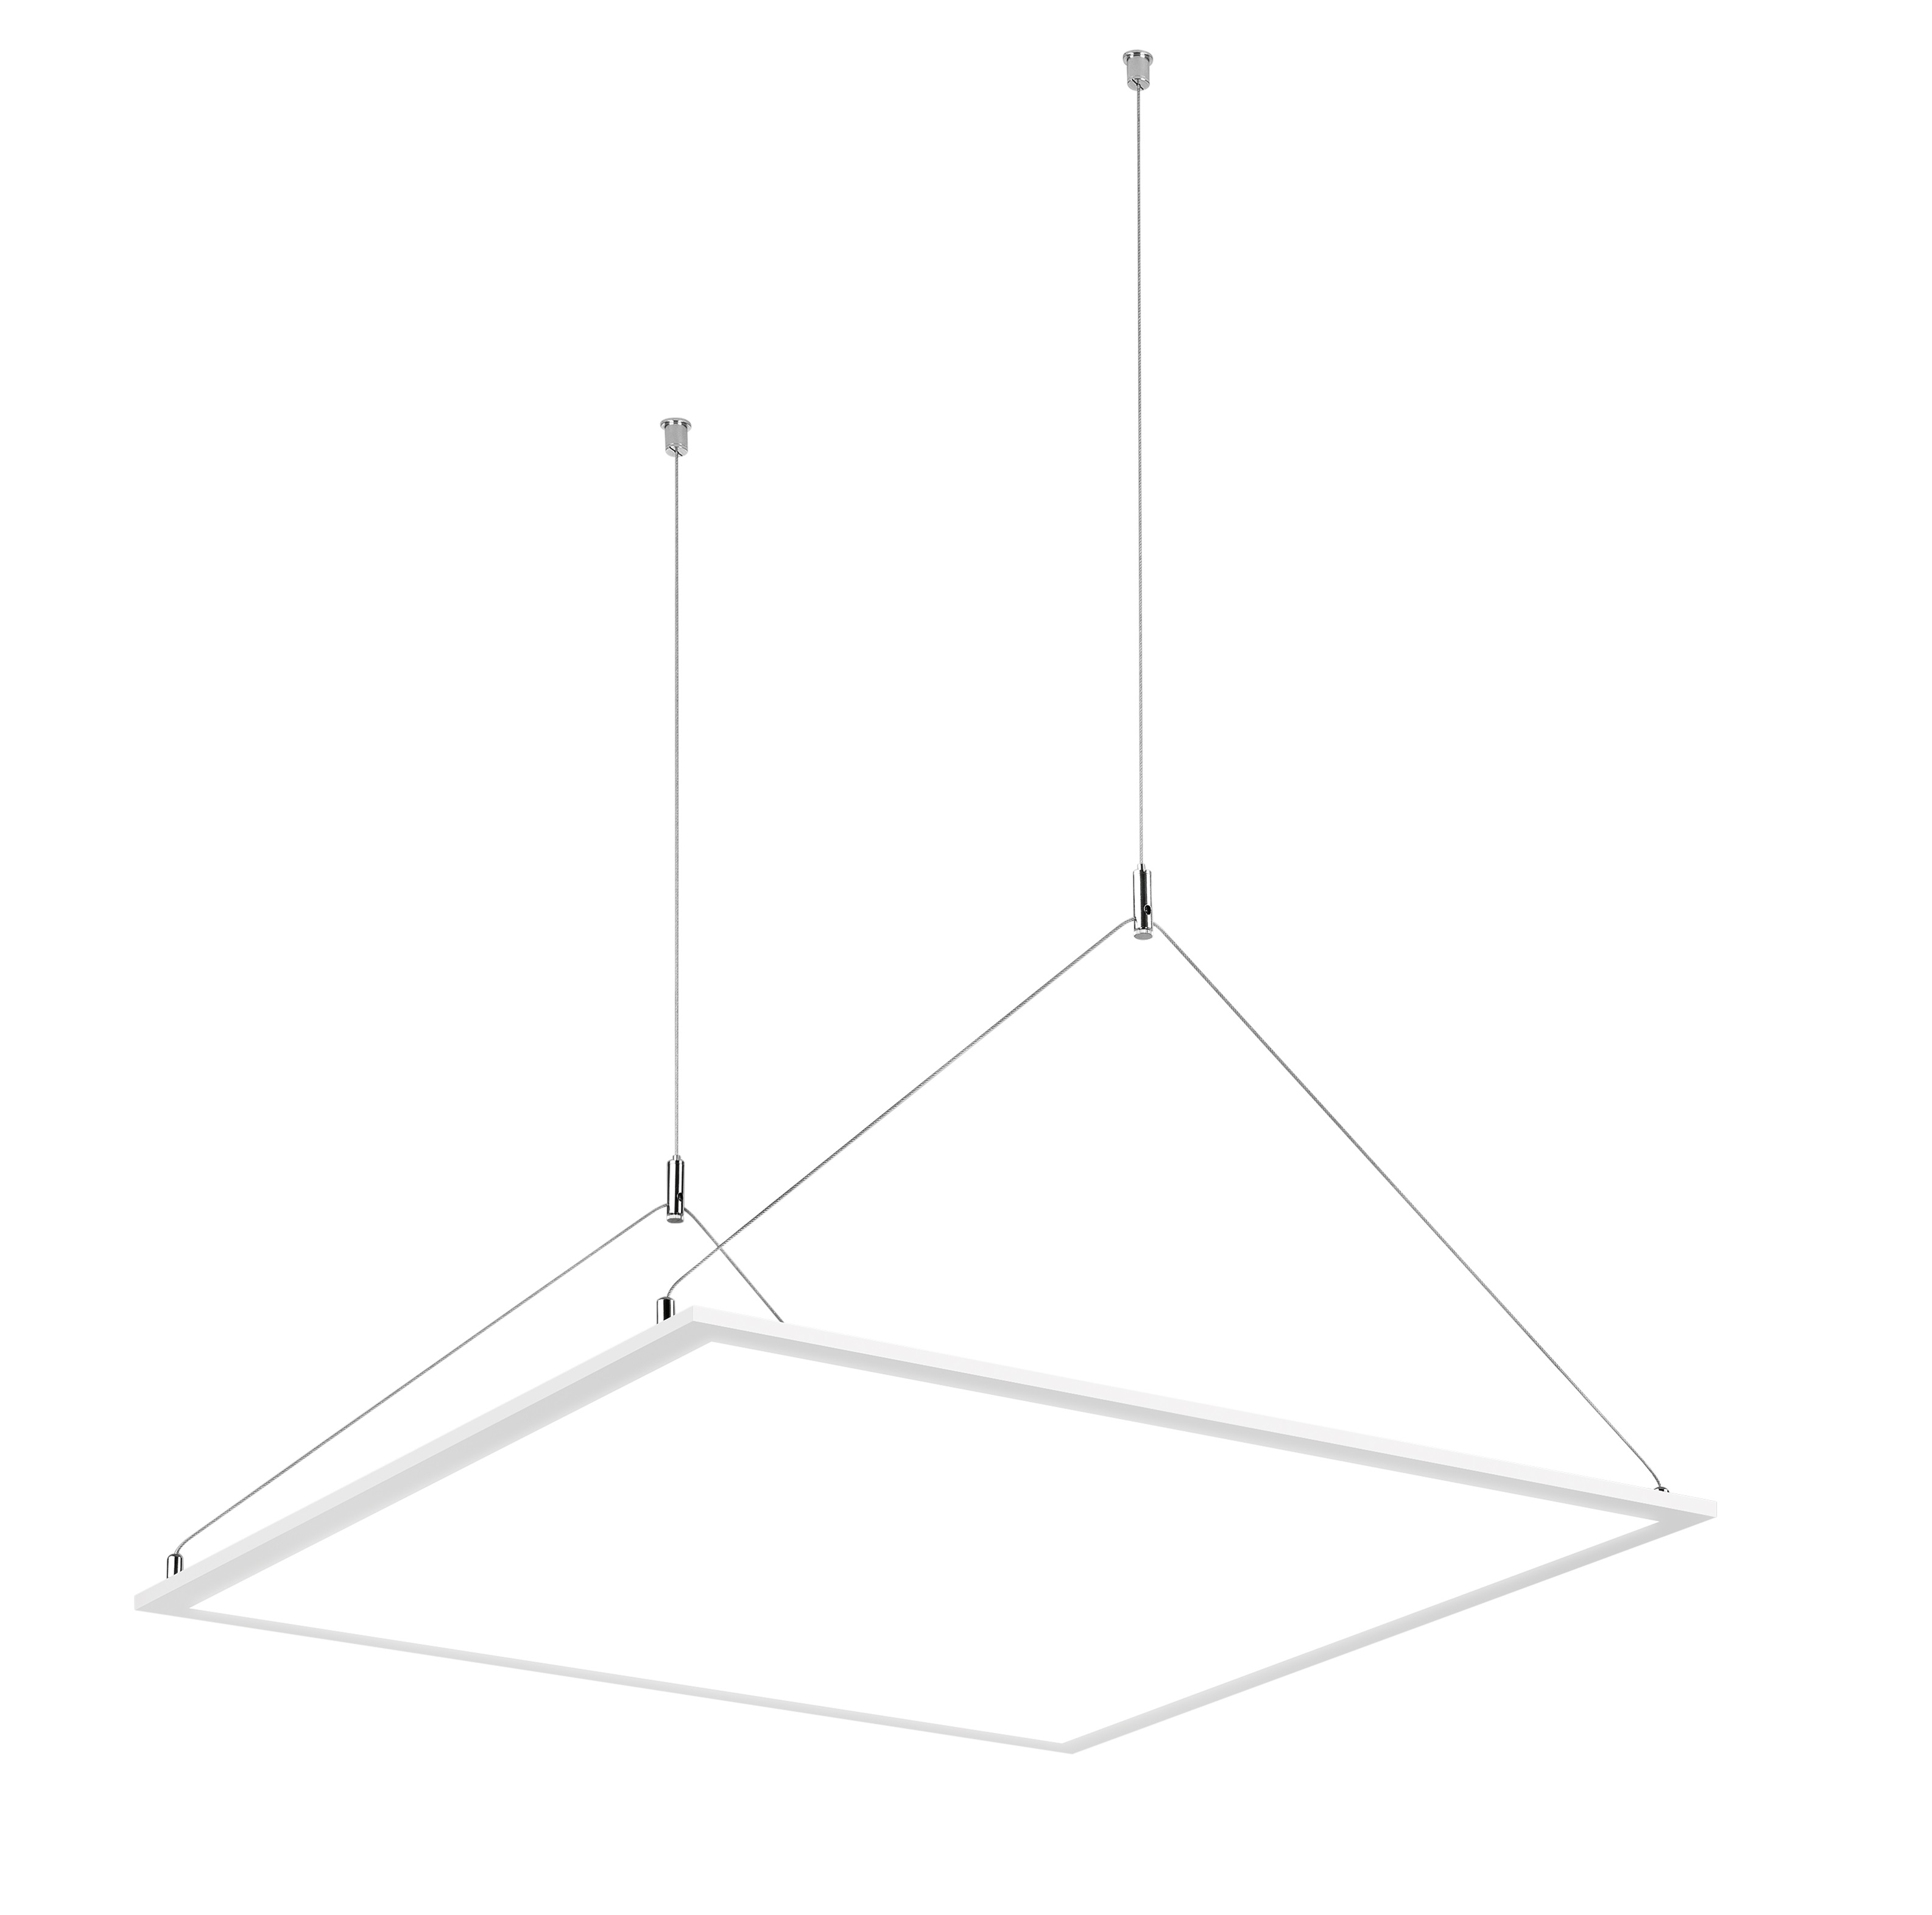 1 Stk LED Panel Seilaufhängung Set  2x2m LI29001228